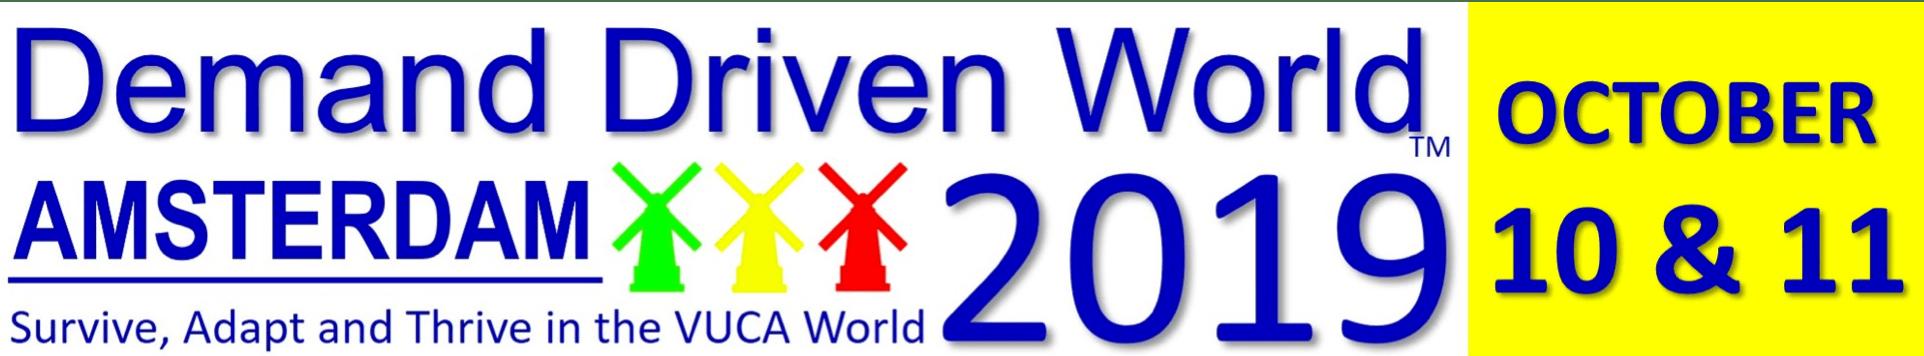 Demand Driven World 2019